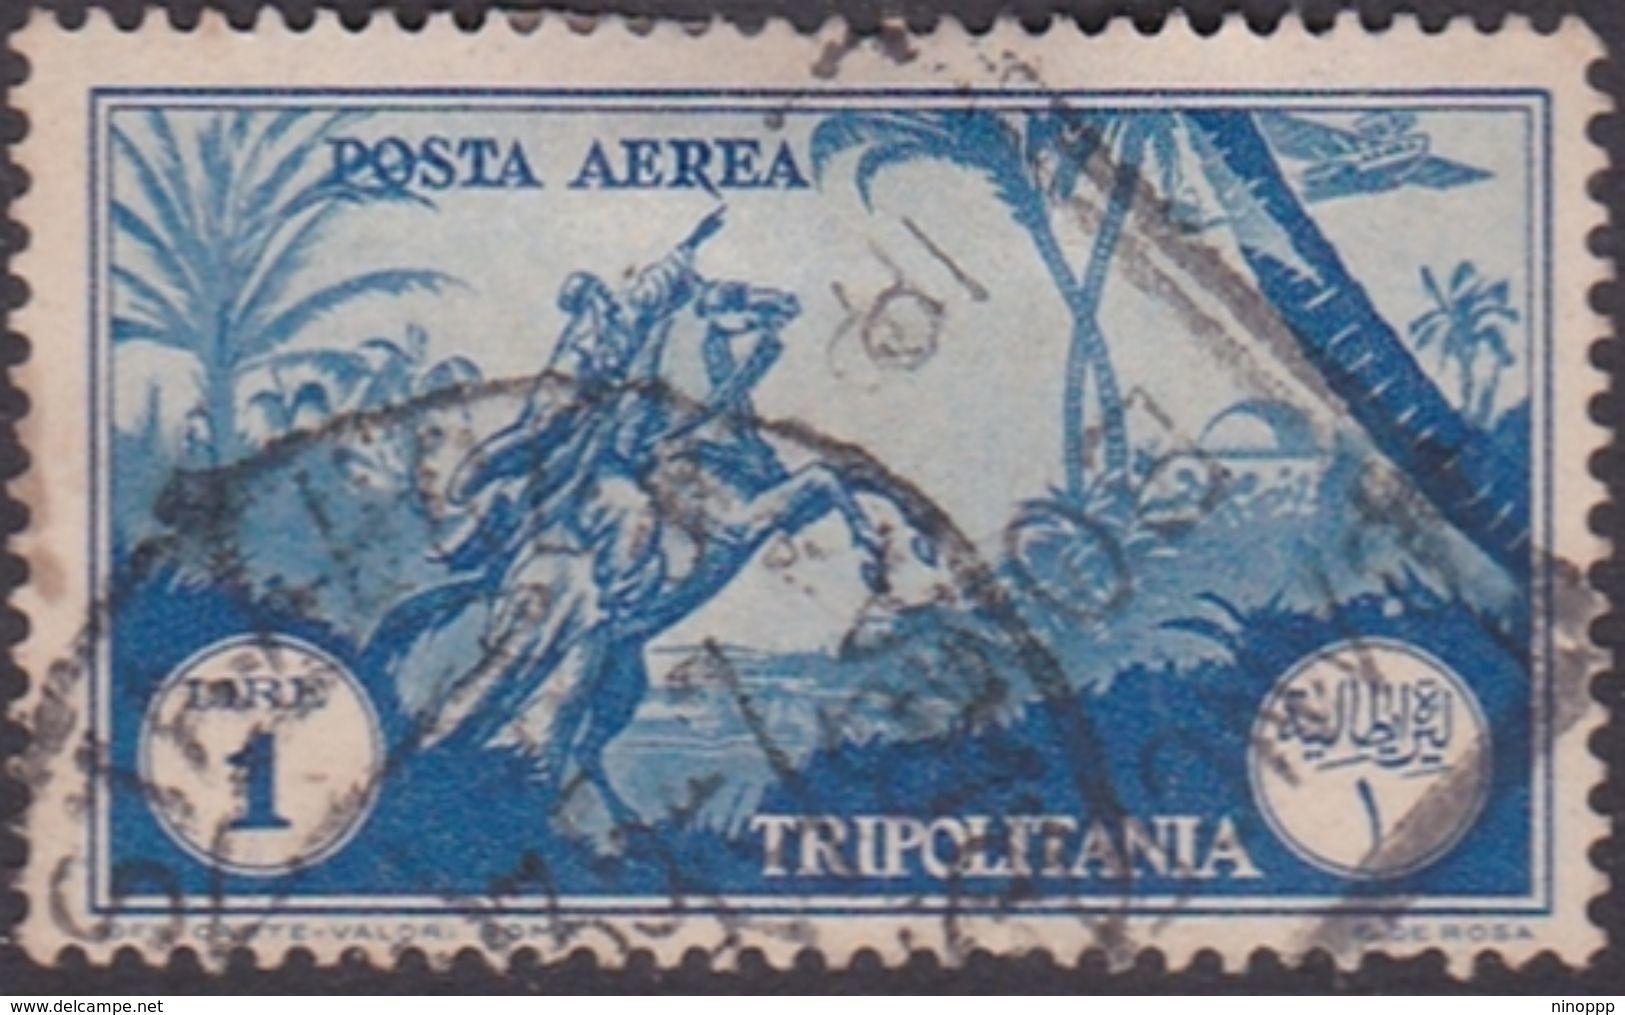 Italy-Colonies And Territories-Tripolitania A13  1931 Air Horseman, 1 Lira Blue Used - Tripolitania